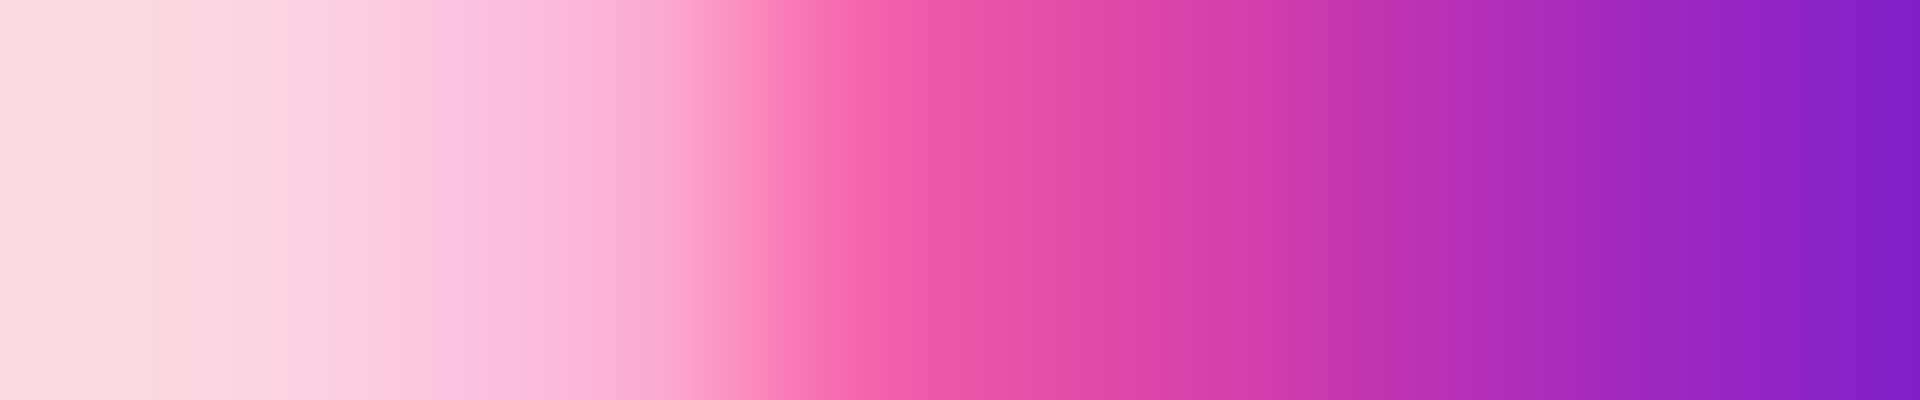 rosa, pink, lila